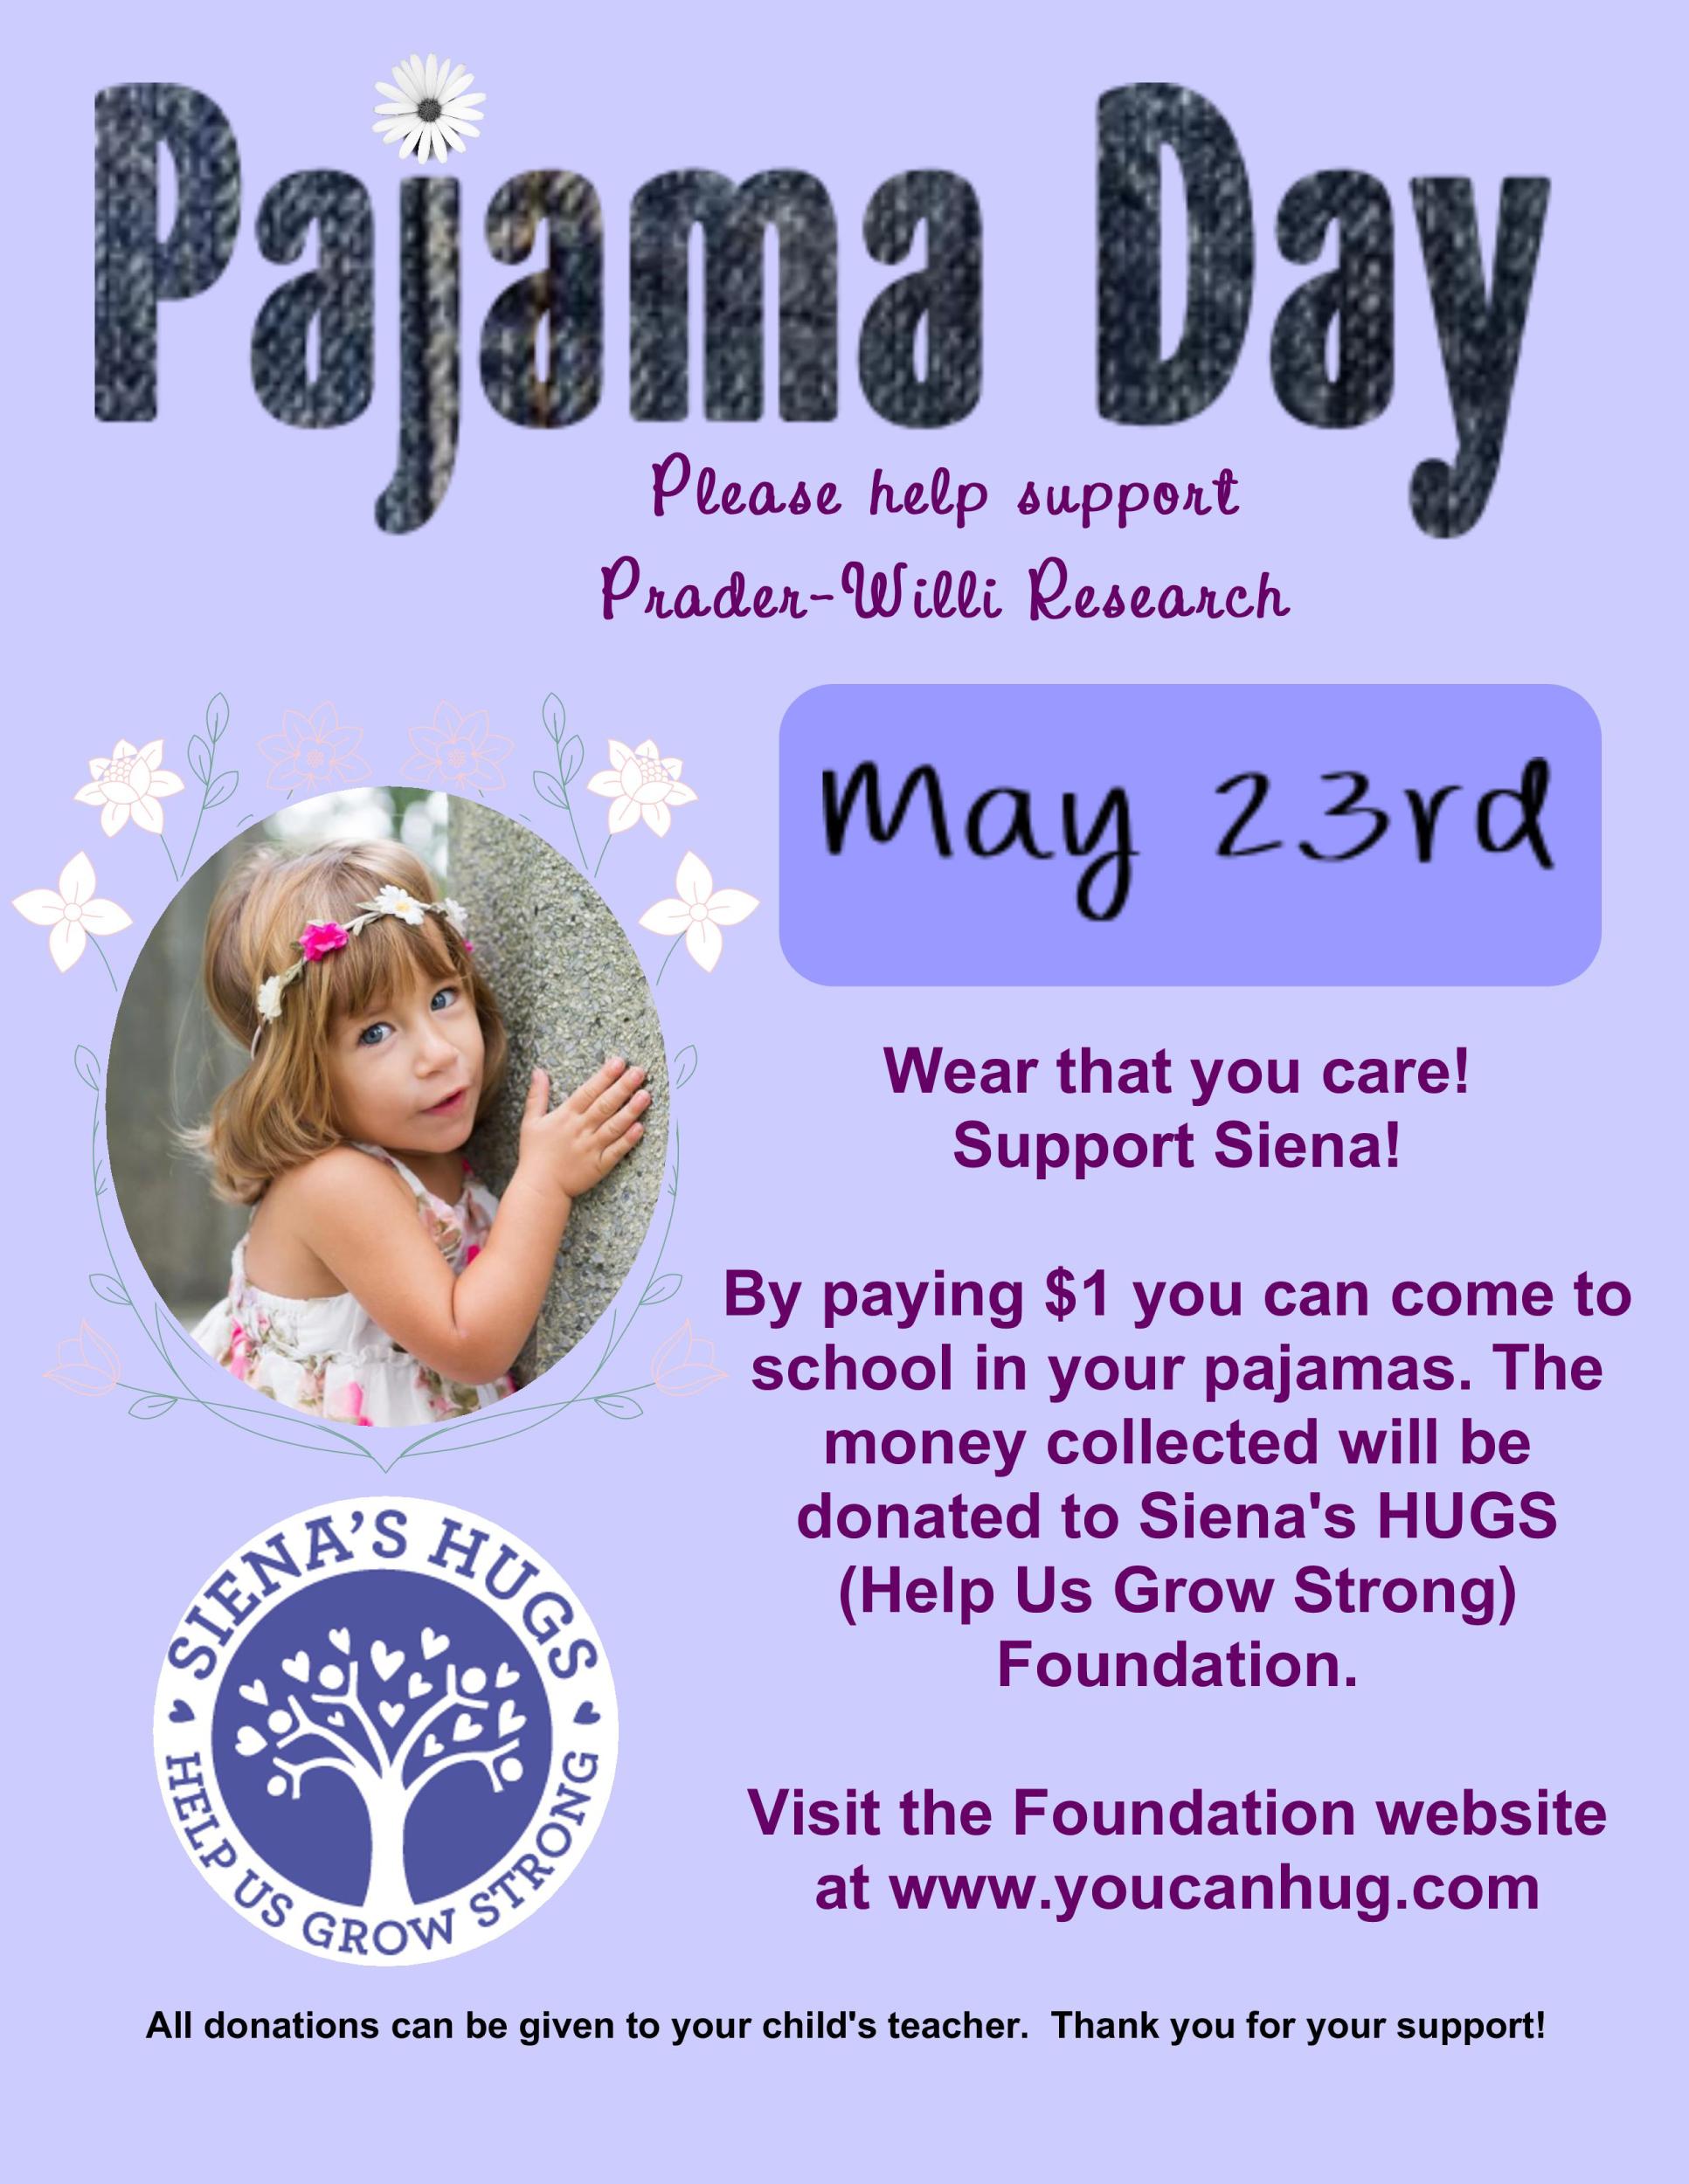 Pajama Day Pws Awareness At School Week